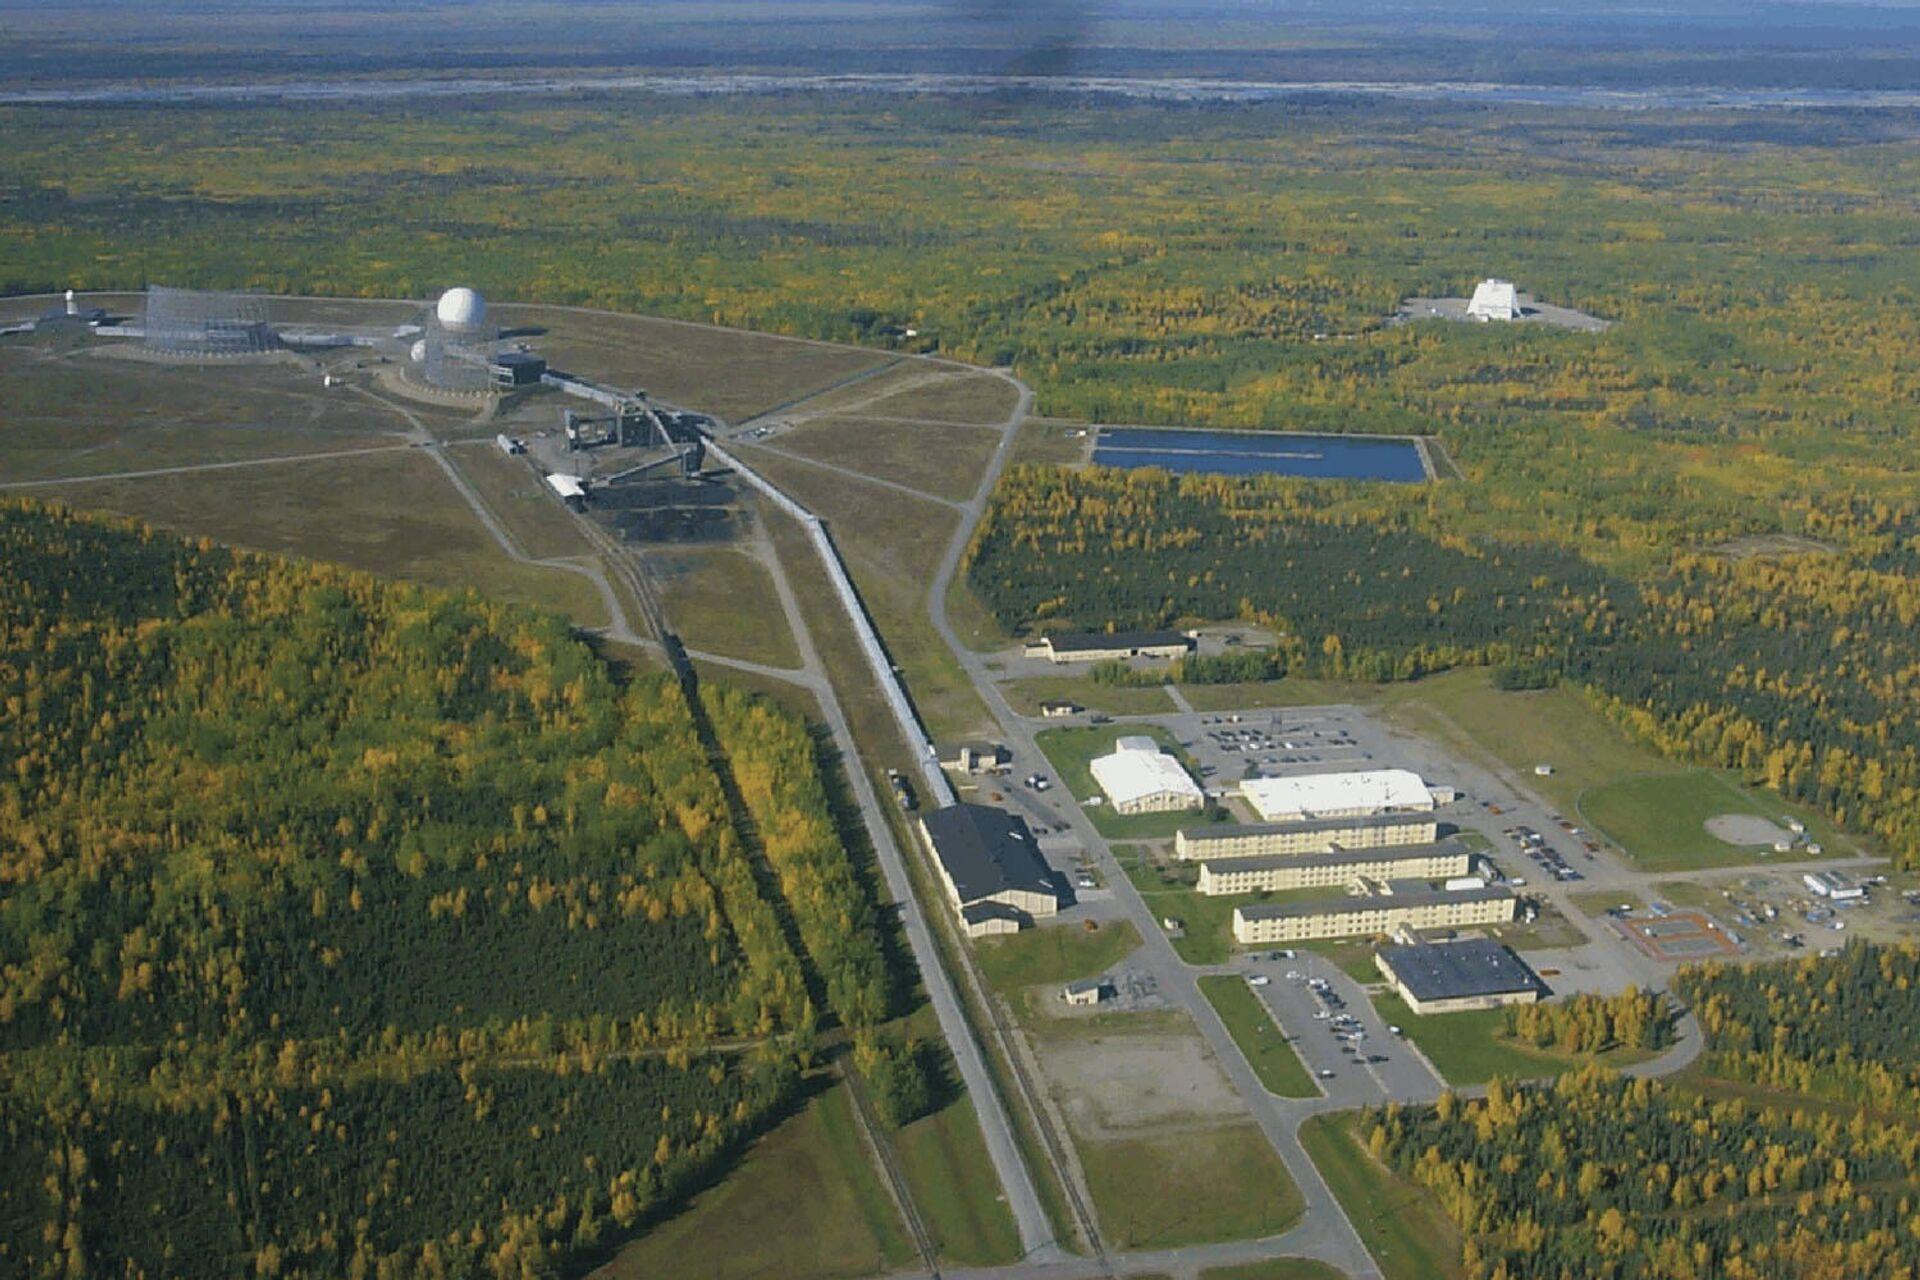 Радиолокационная станция ВВС США Clear Air Force Station на Аляске - РИА Новости, 1920, 25.03.2021